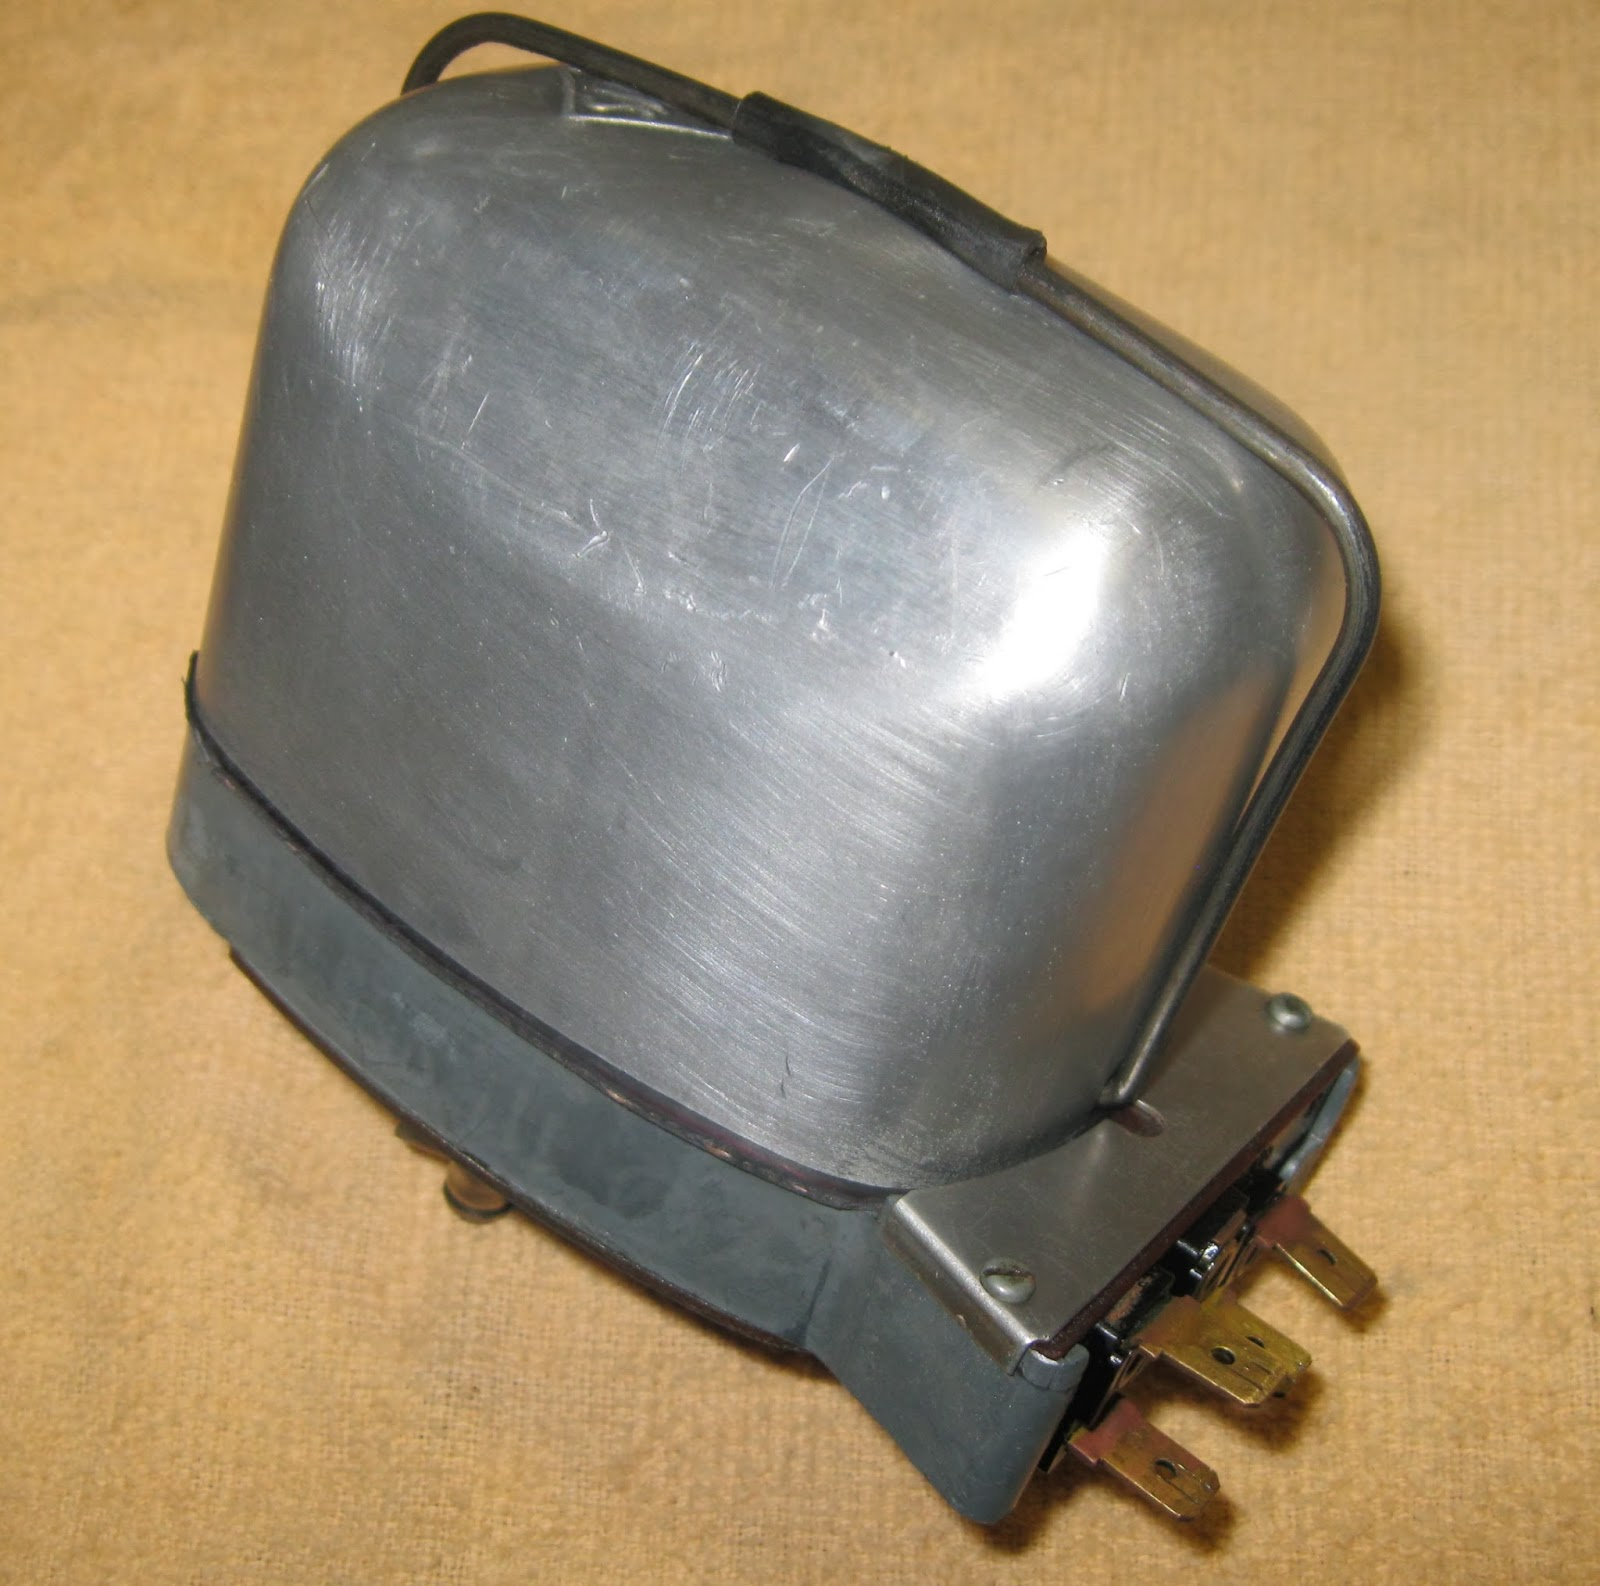 Saab journal volkswagen windshield wiper motor for Vw bug windshield wiper motor